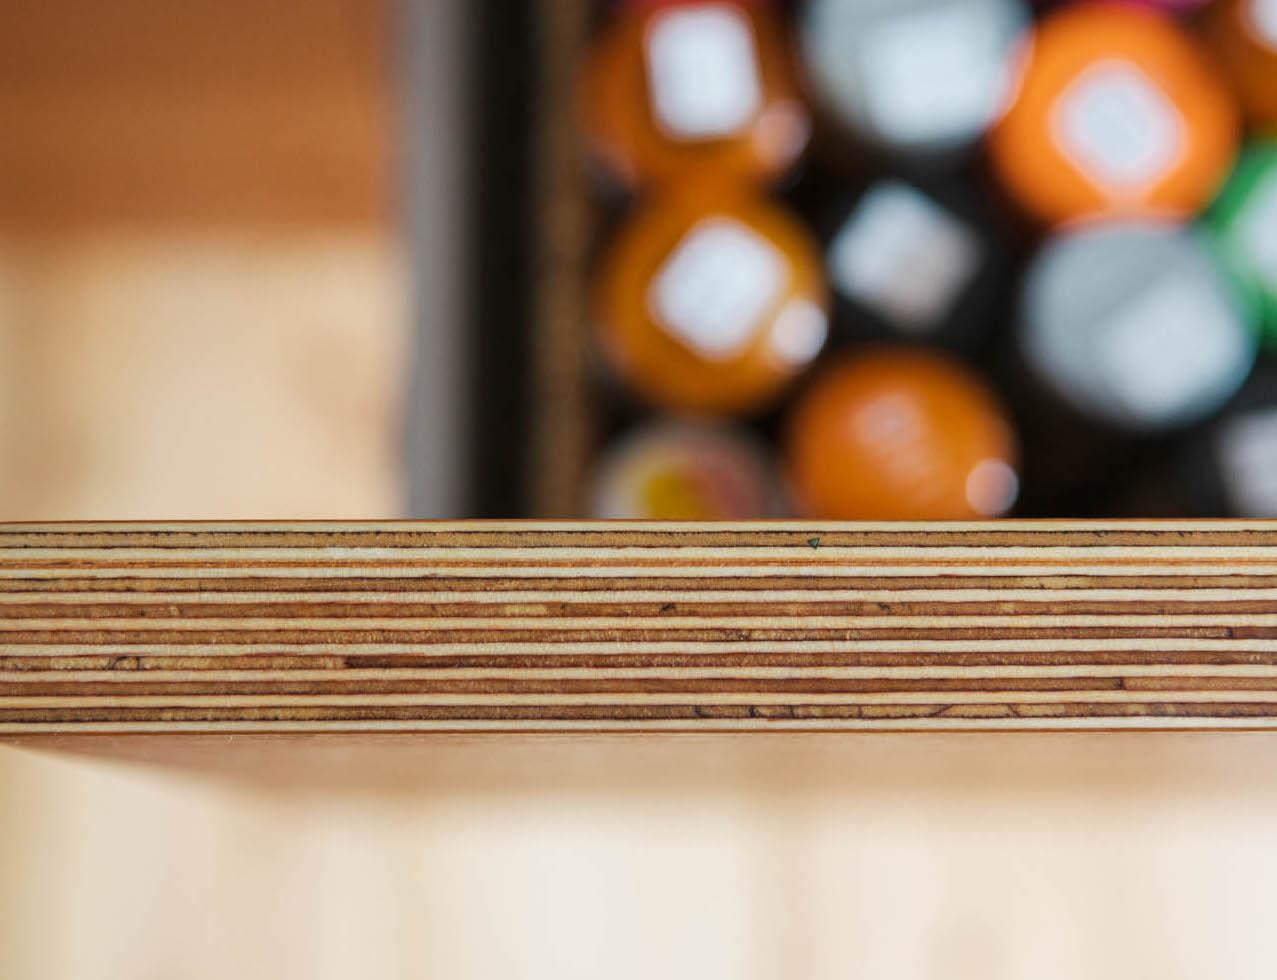 plywood design, quality materials, craftmanship